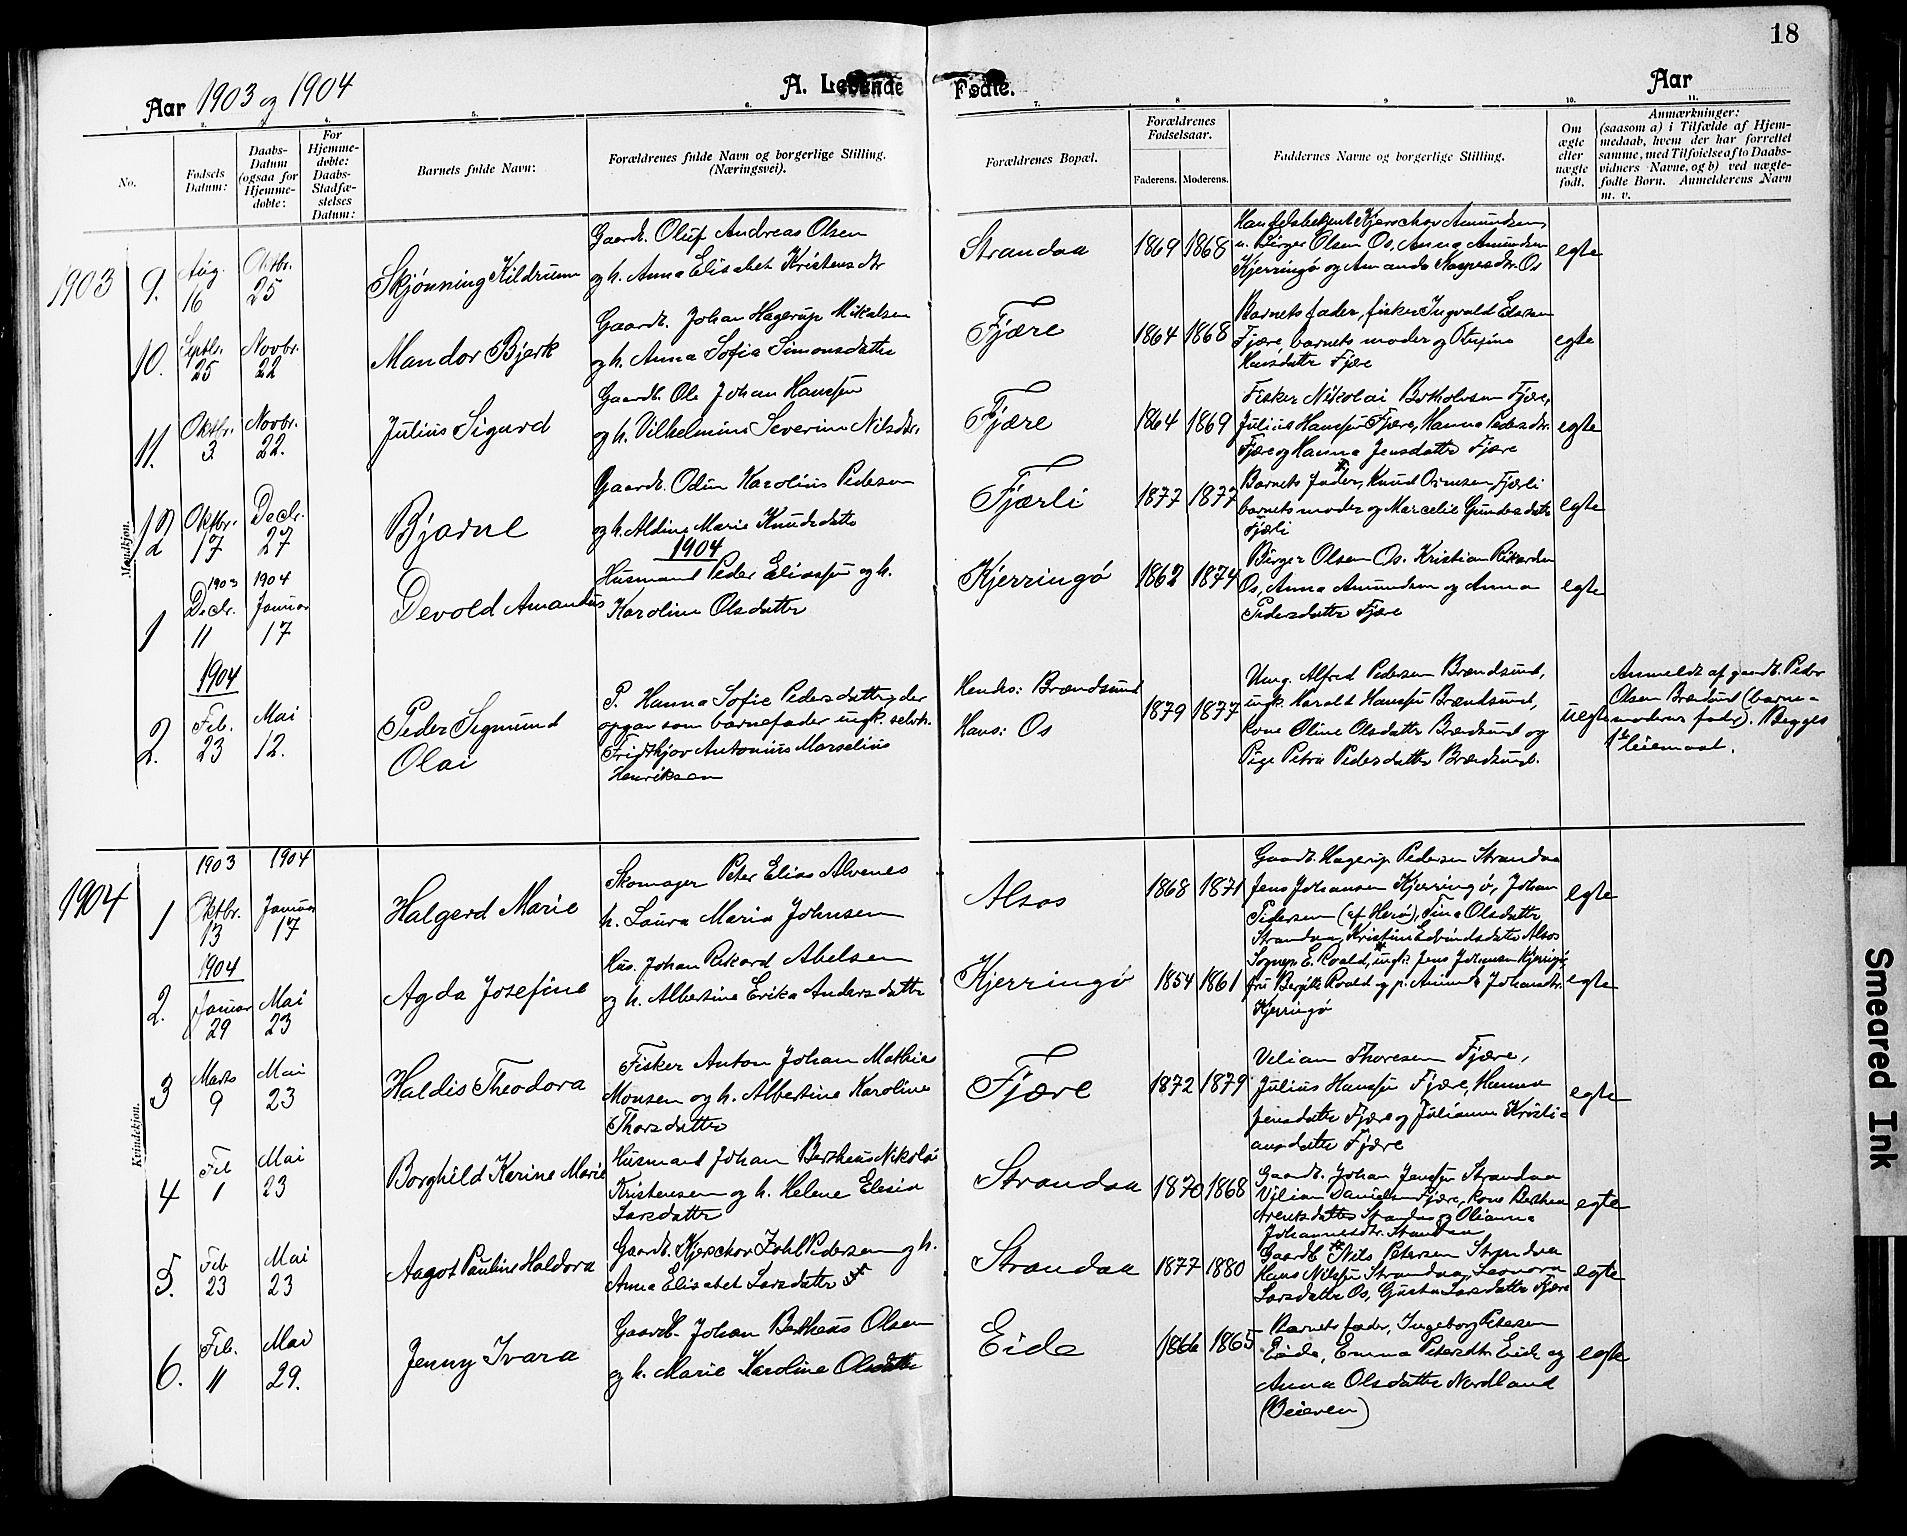 SAT, Ministerialprotokoller, klokkerbøker og fødselsregistre - Nordland, 803/L0077: Klokkerbok nr. 803C04, 1897-1930, s. 18